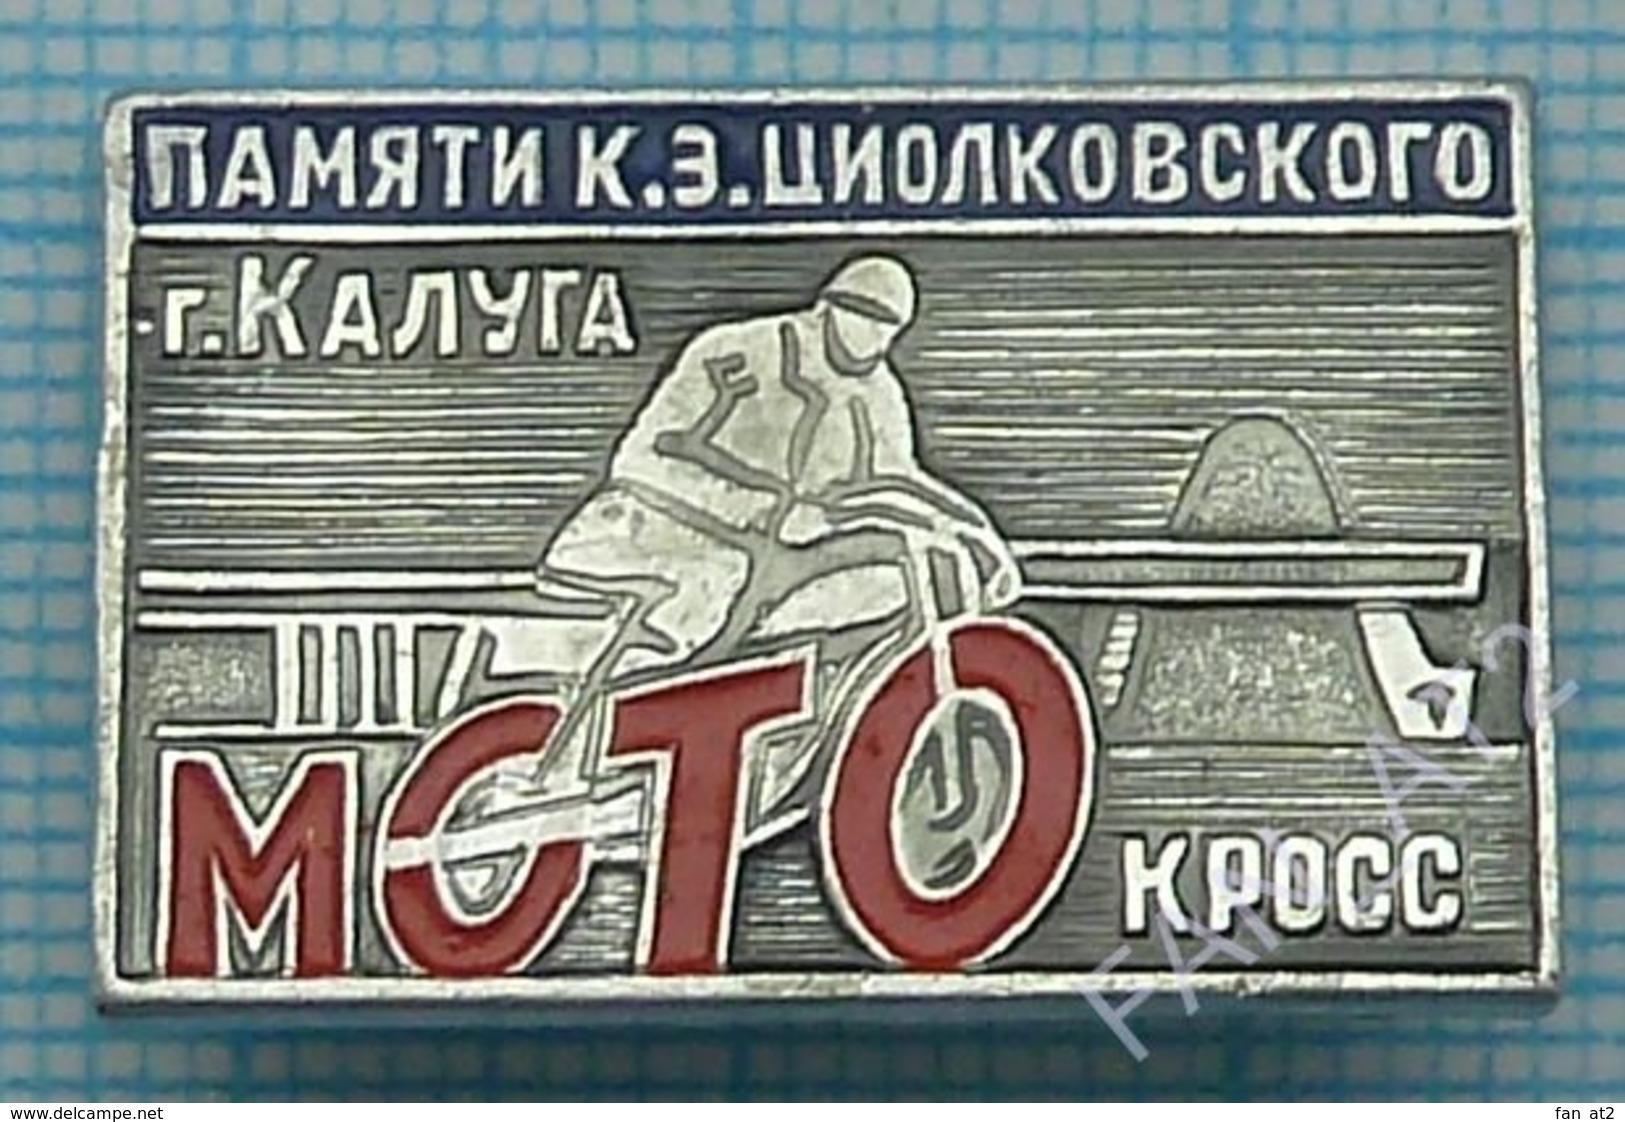 USSR / Badge / Soviet Union / RUSSIA Motorcycling Moto  Motocross Memory Tsiolkovsky. Kaluga 1970s - Pin